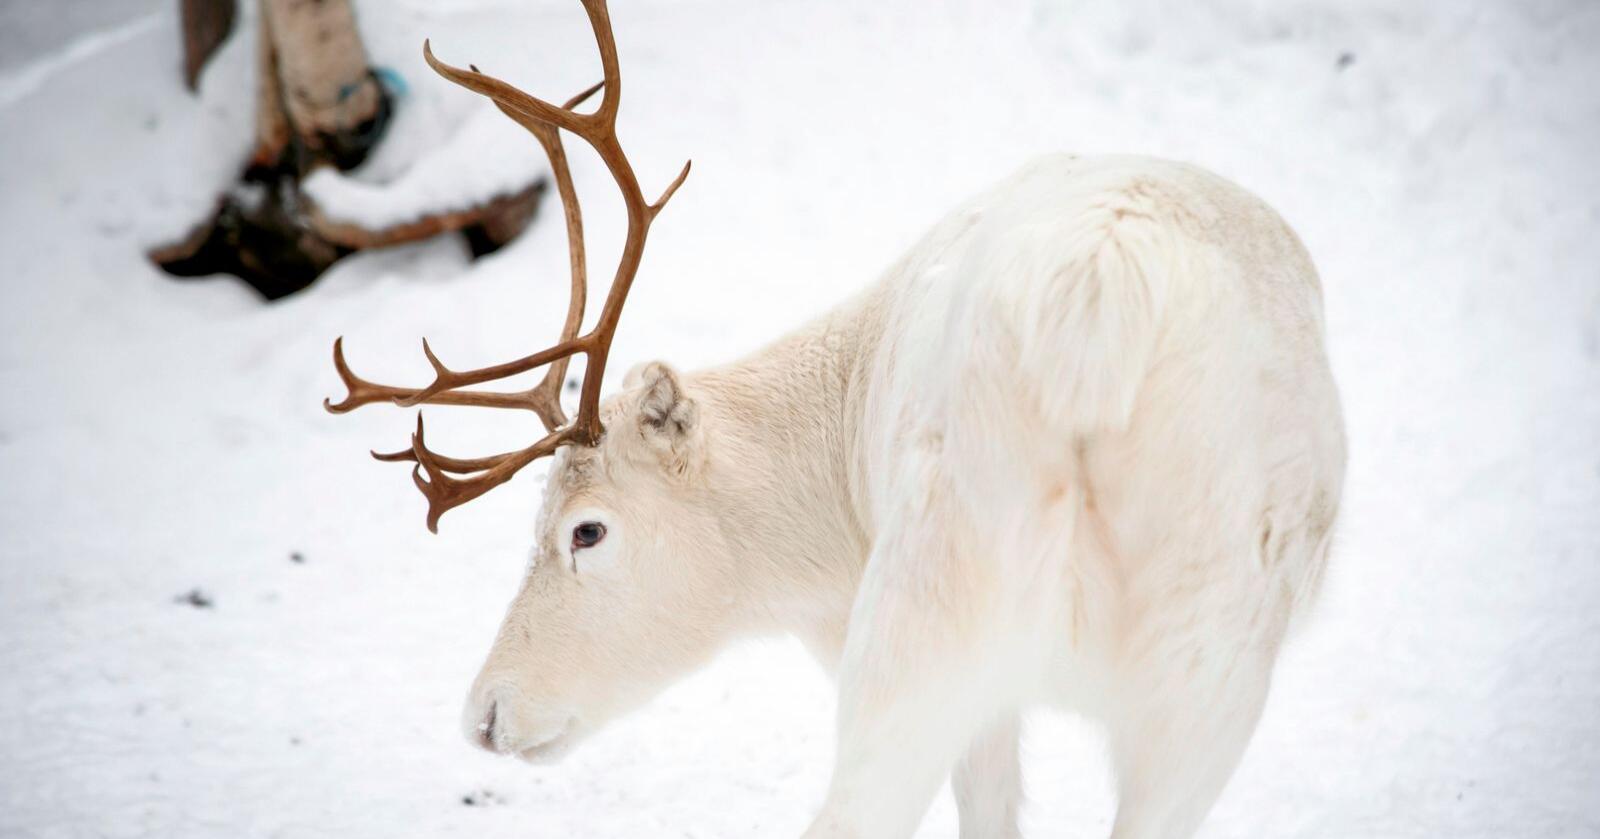 Et reinsdyr i Karasjok. Arkivfoto: Heiko Junge / NTB scanpix